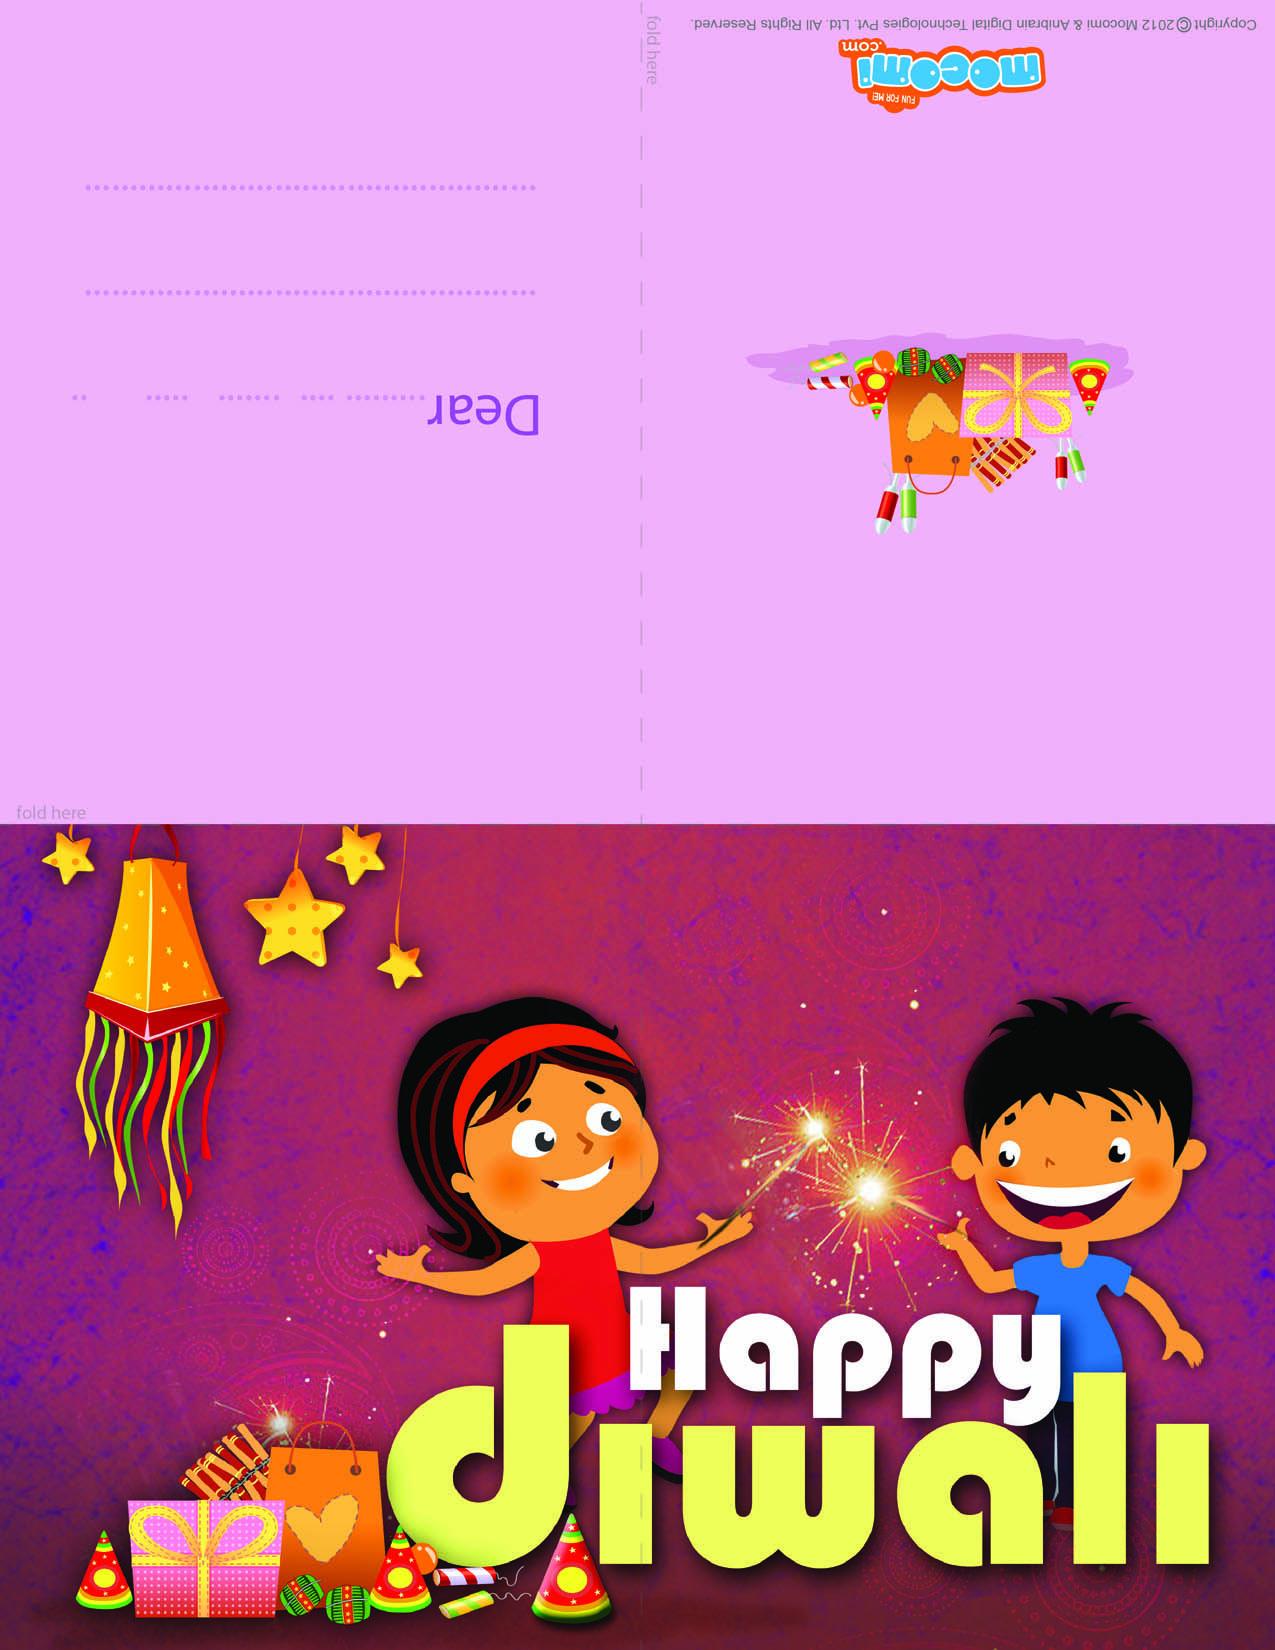 Happy Diwali Diwali Greeting Card For Kids Happy Diwali